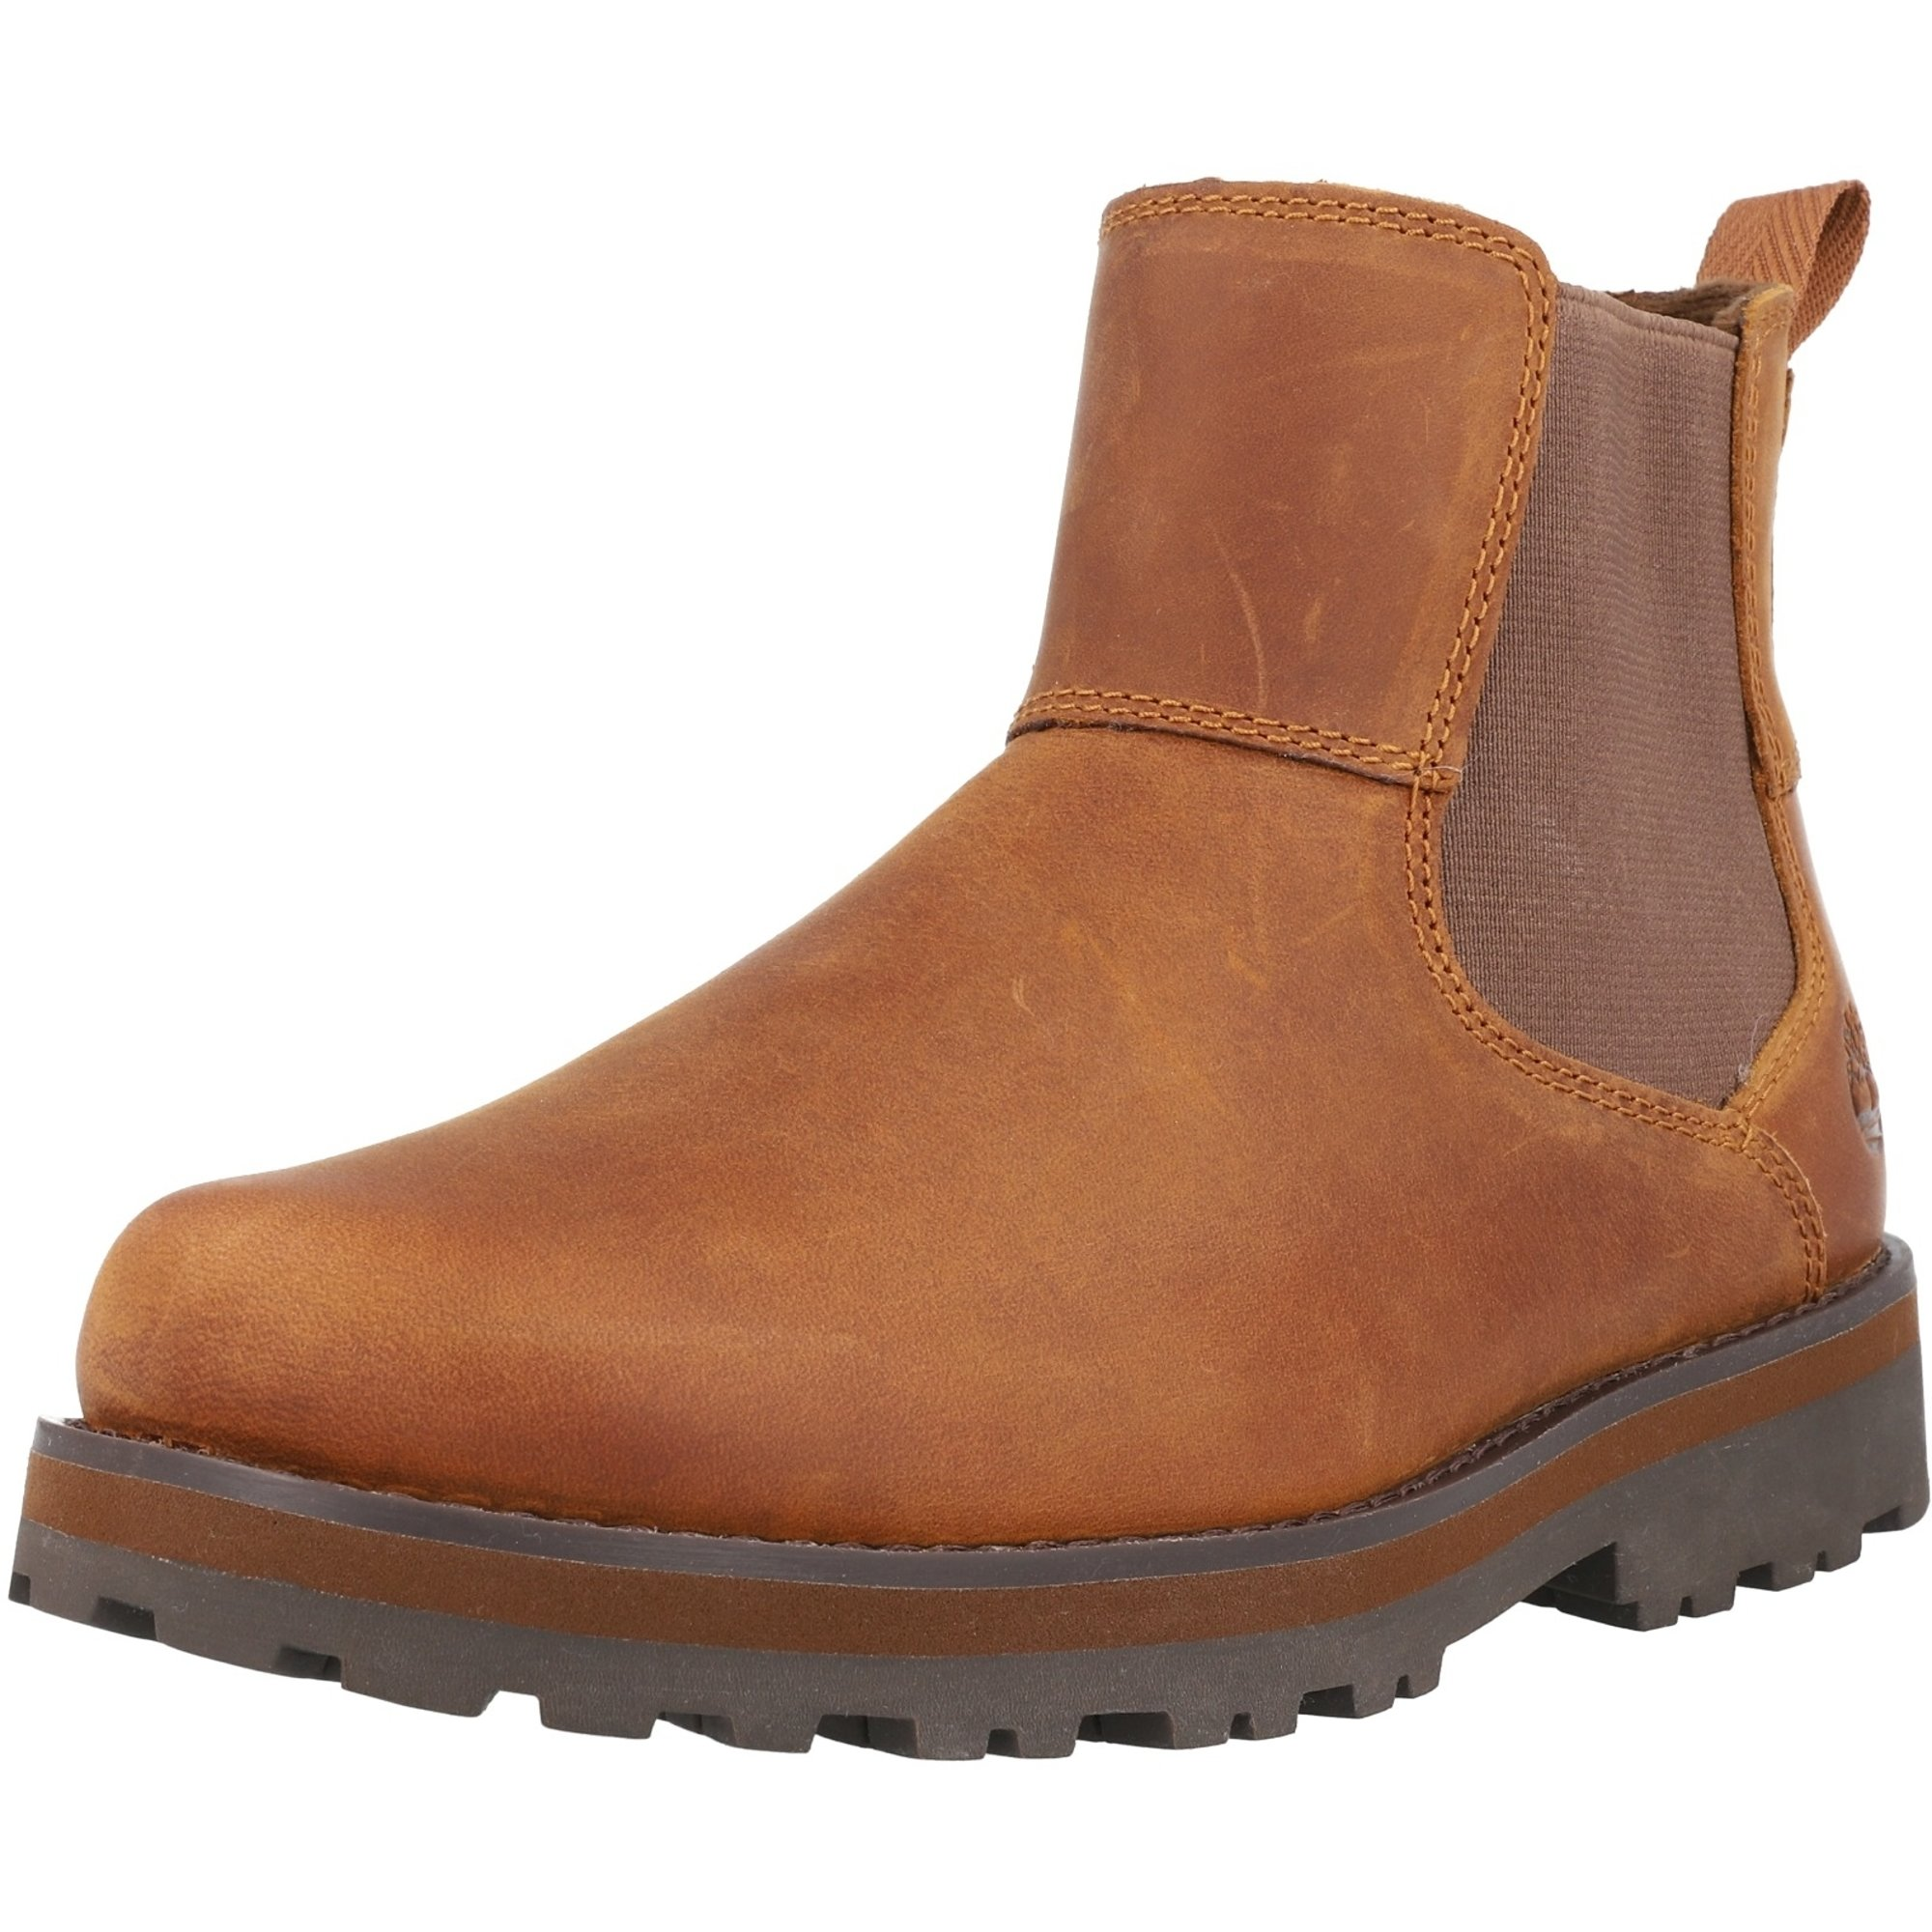 Timberland Courma Kid Chelsea J Medium Brown Full Grain Leather